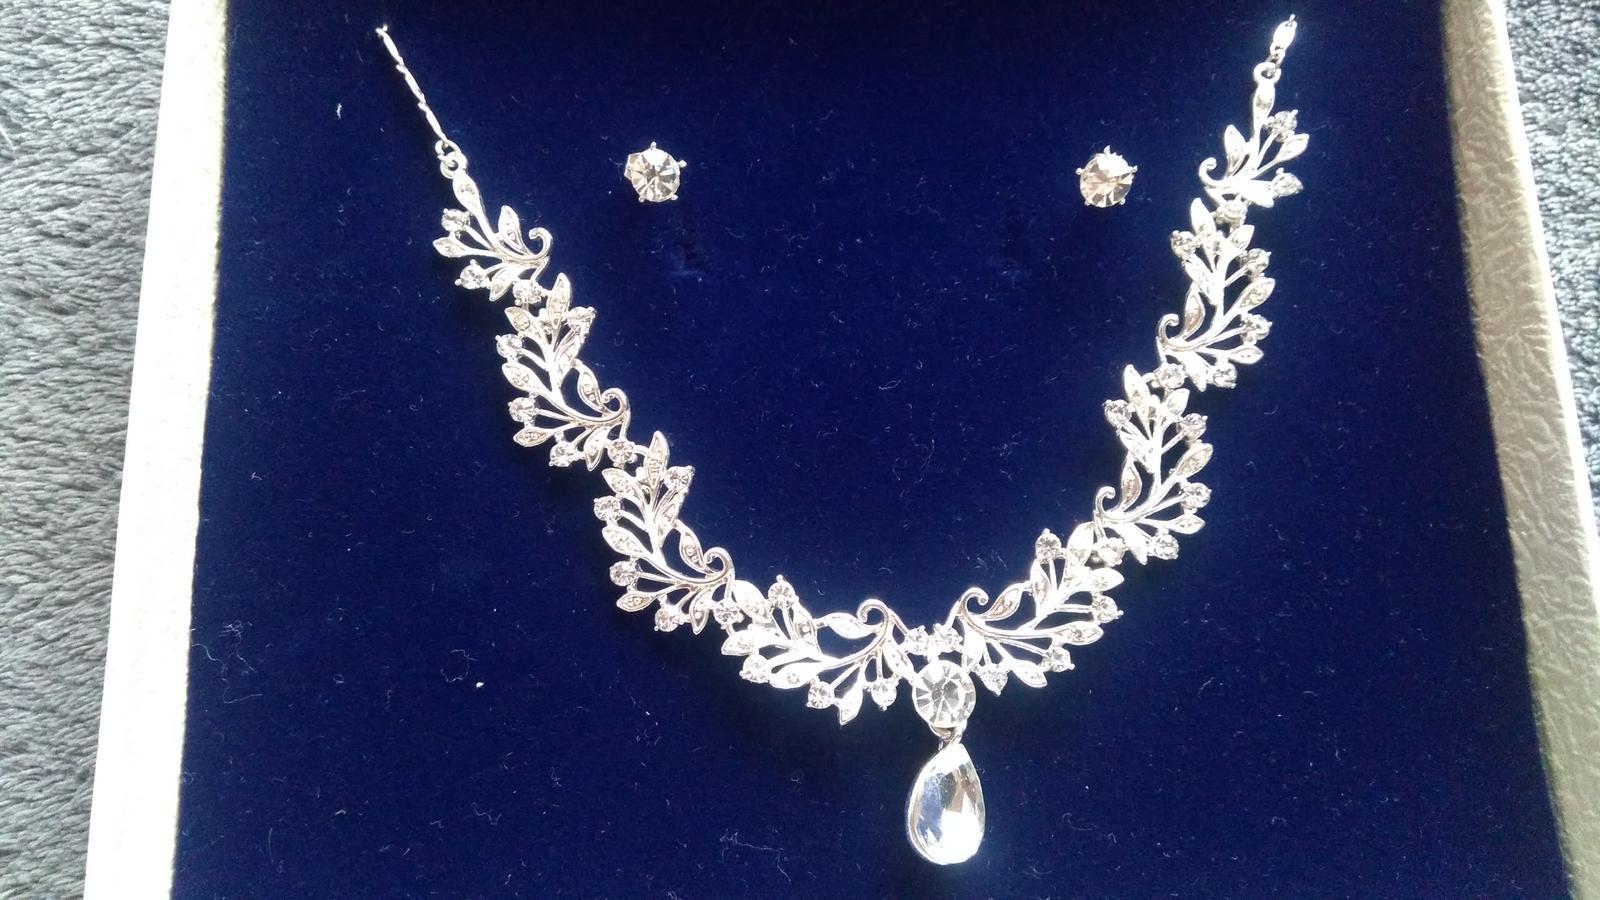 Cirkónový náhrdelník s náušnicami G.Westerleigh - Obrázok č. 1